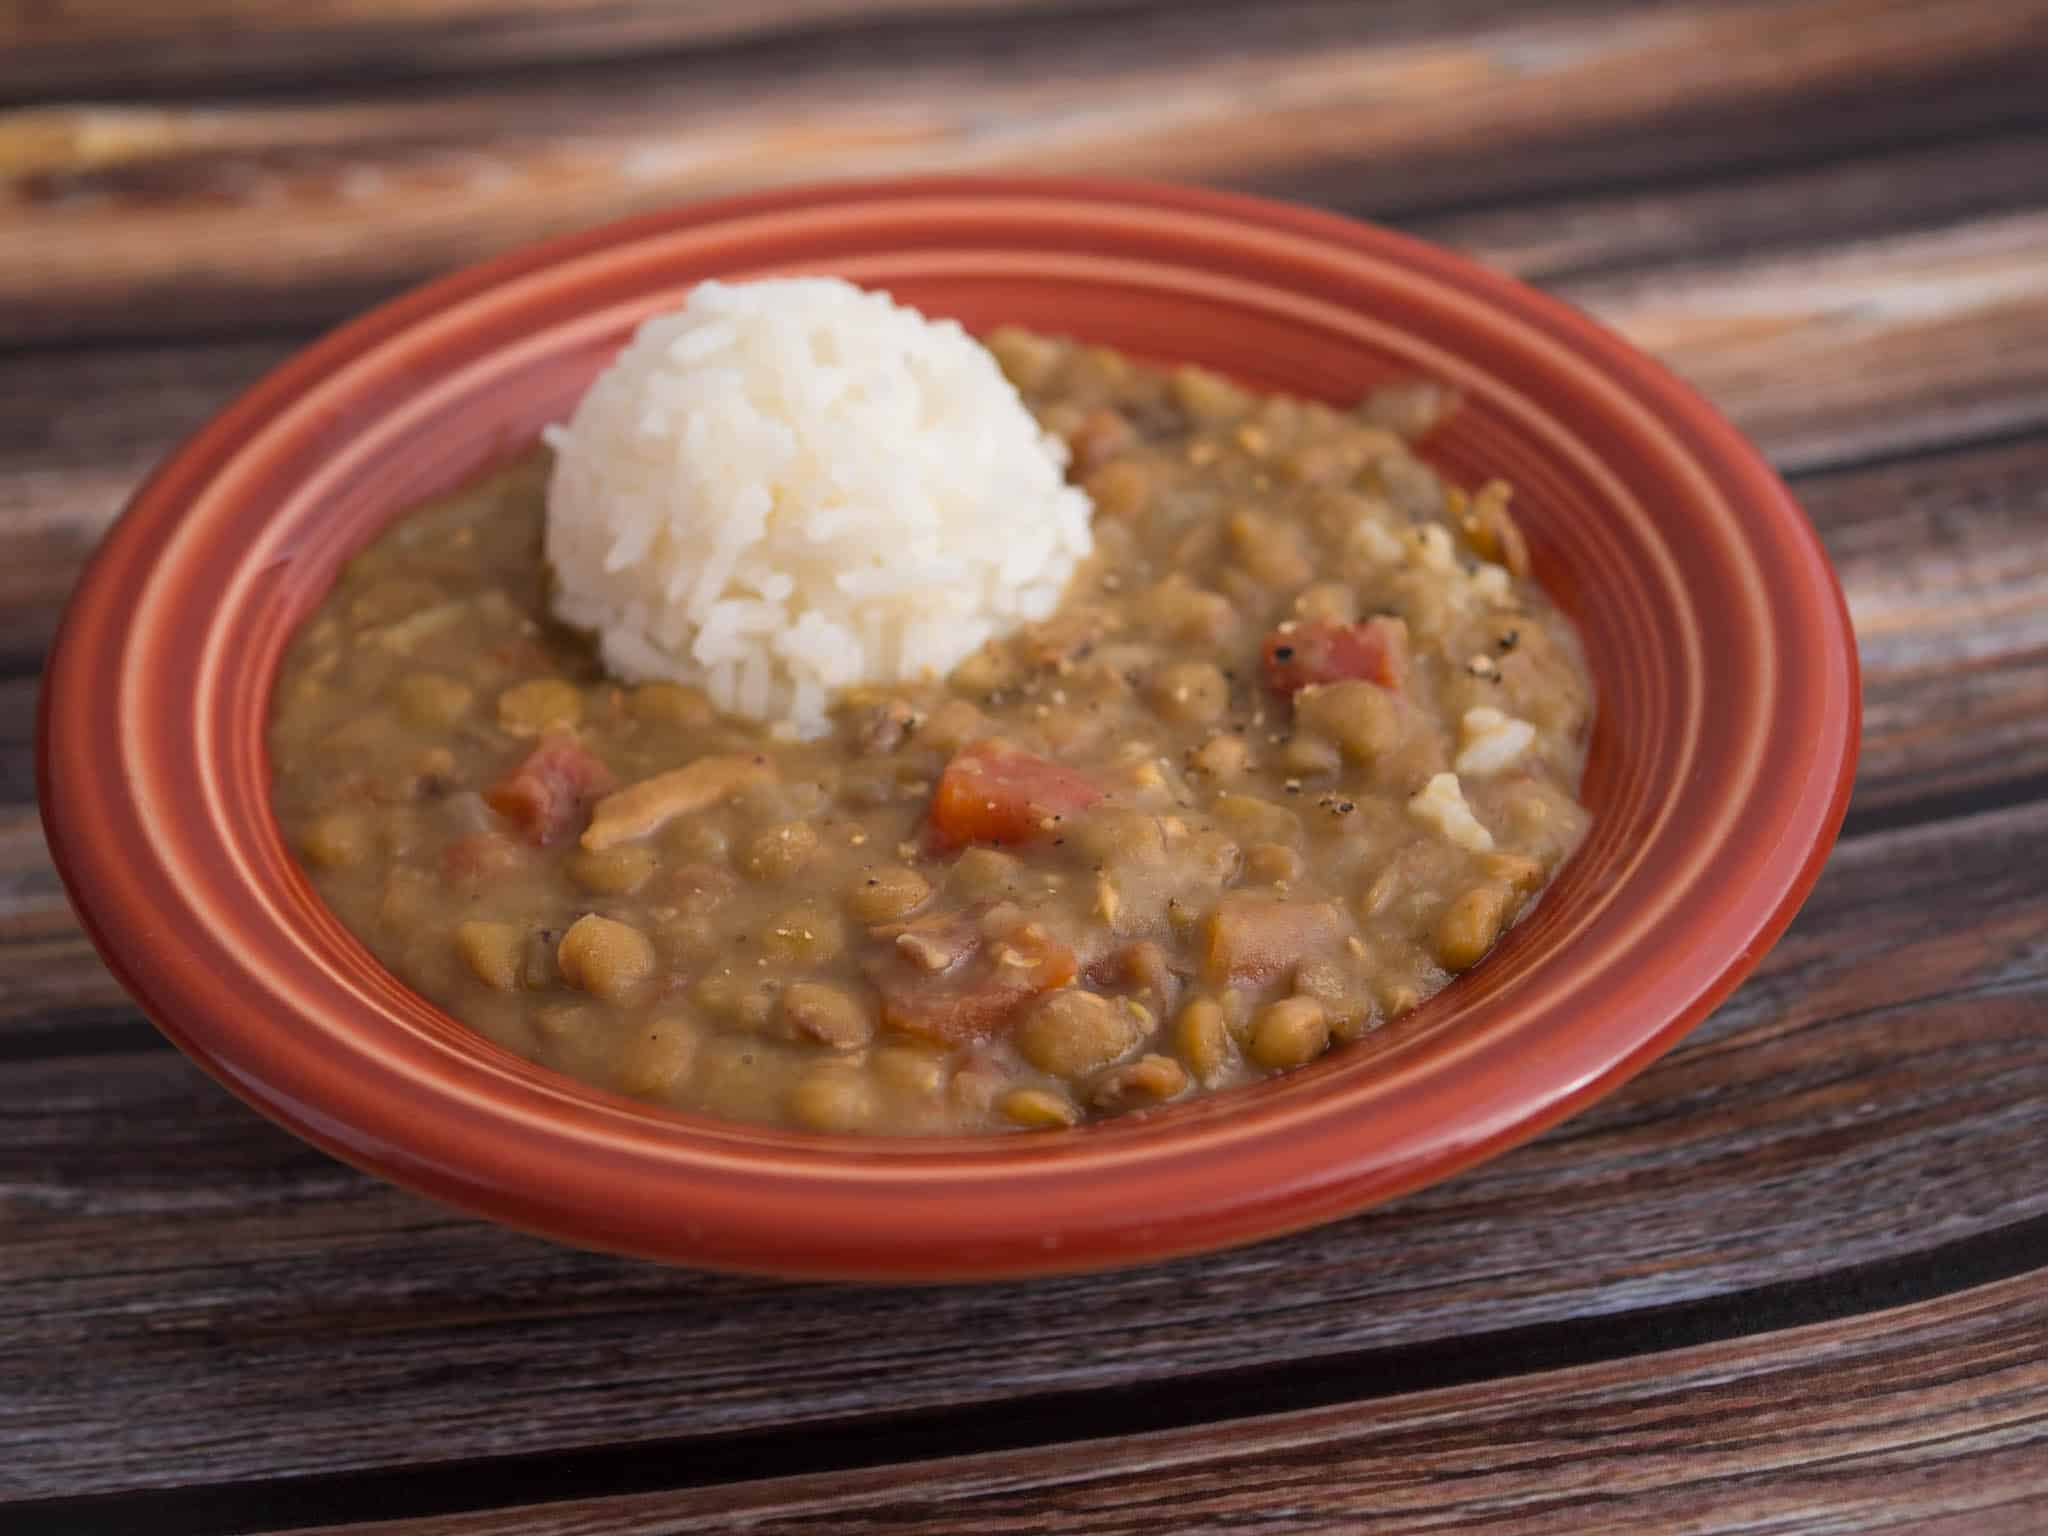 Pressure Cooker Lentil and Bacon Soup | DadCooksDinner.com